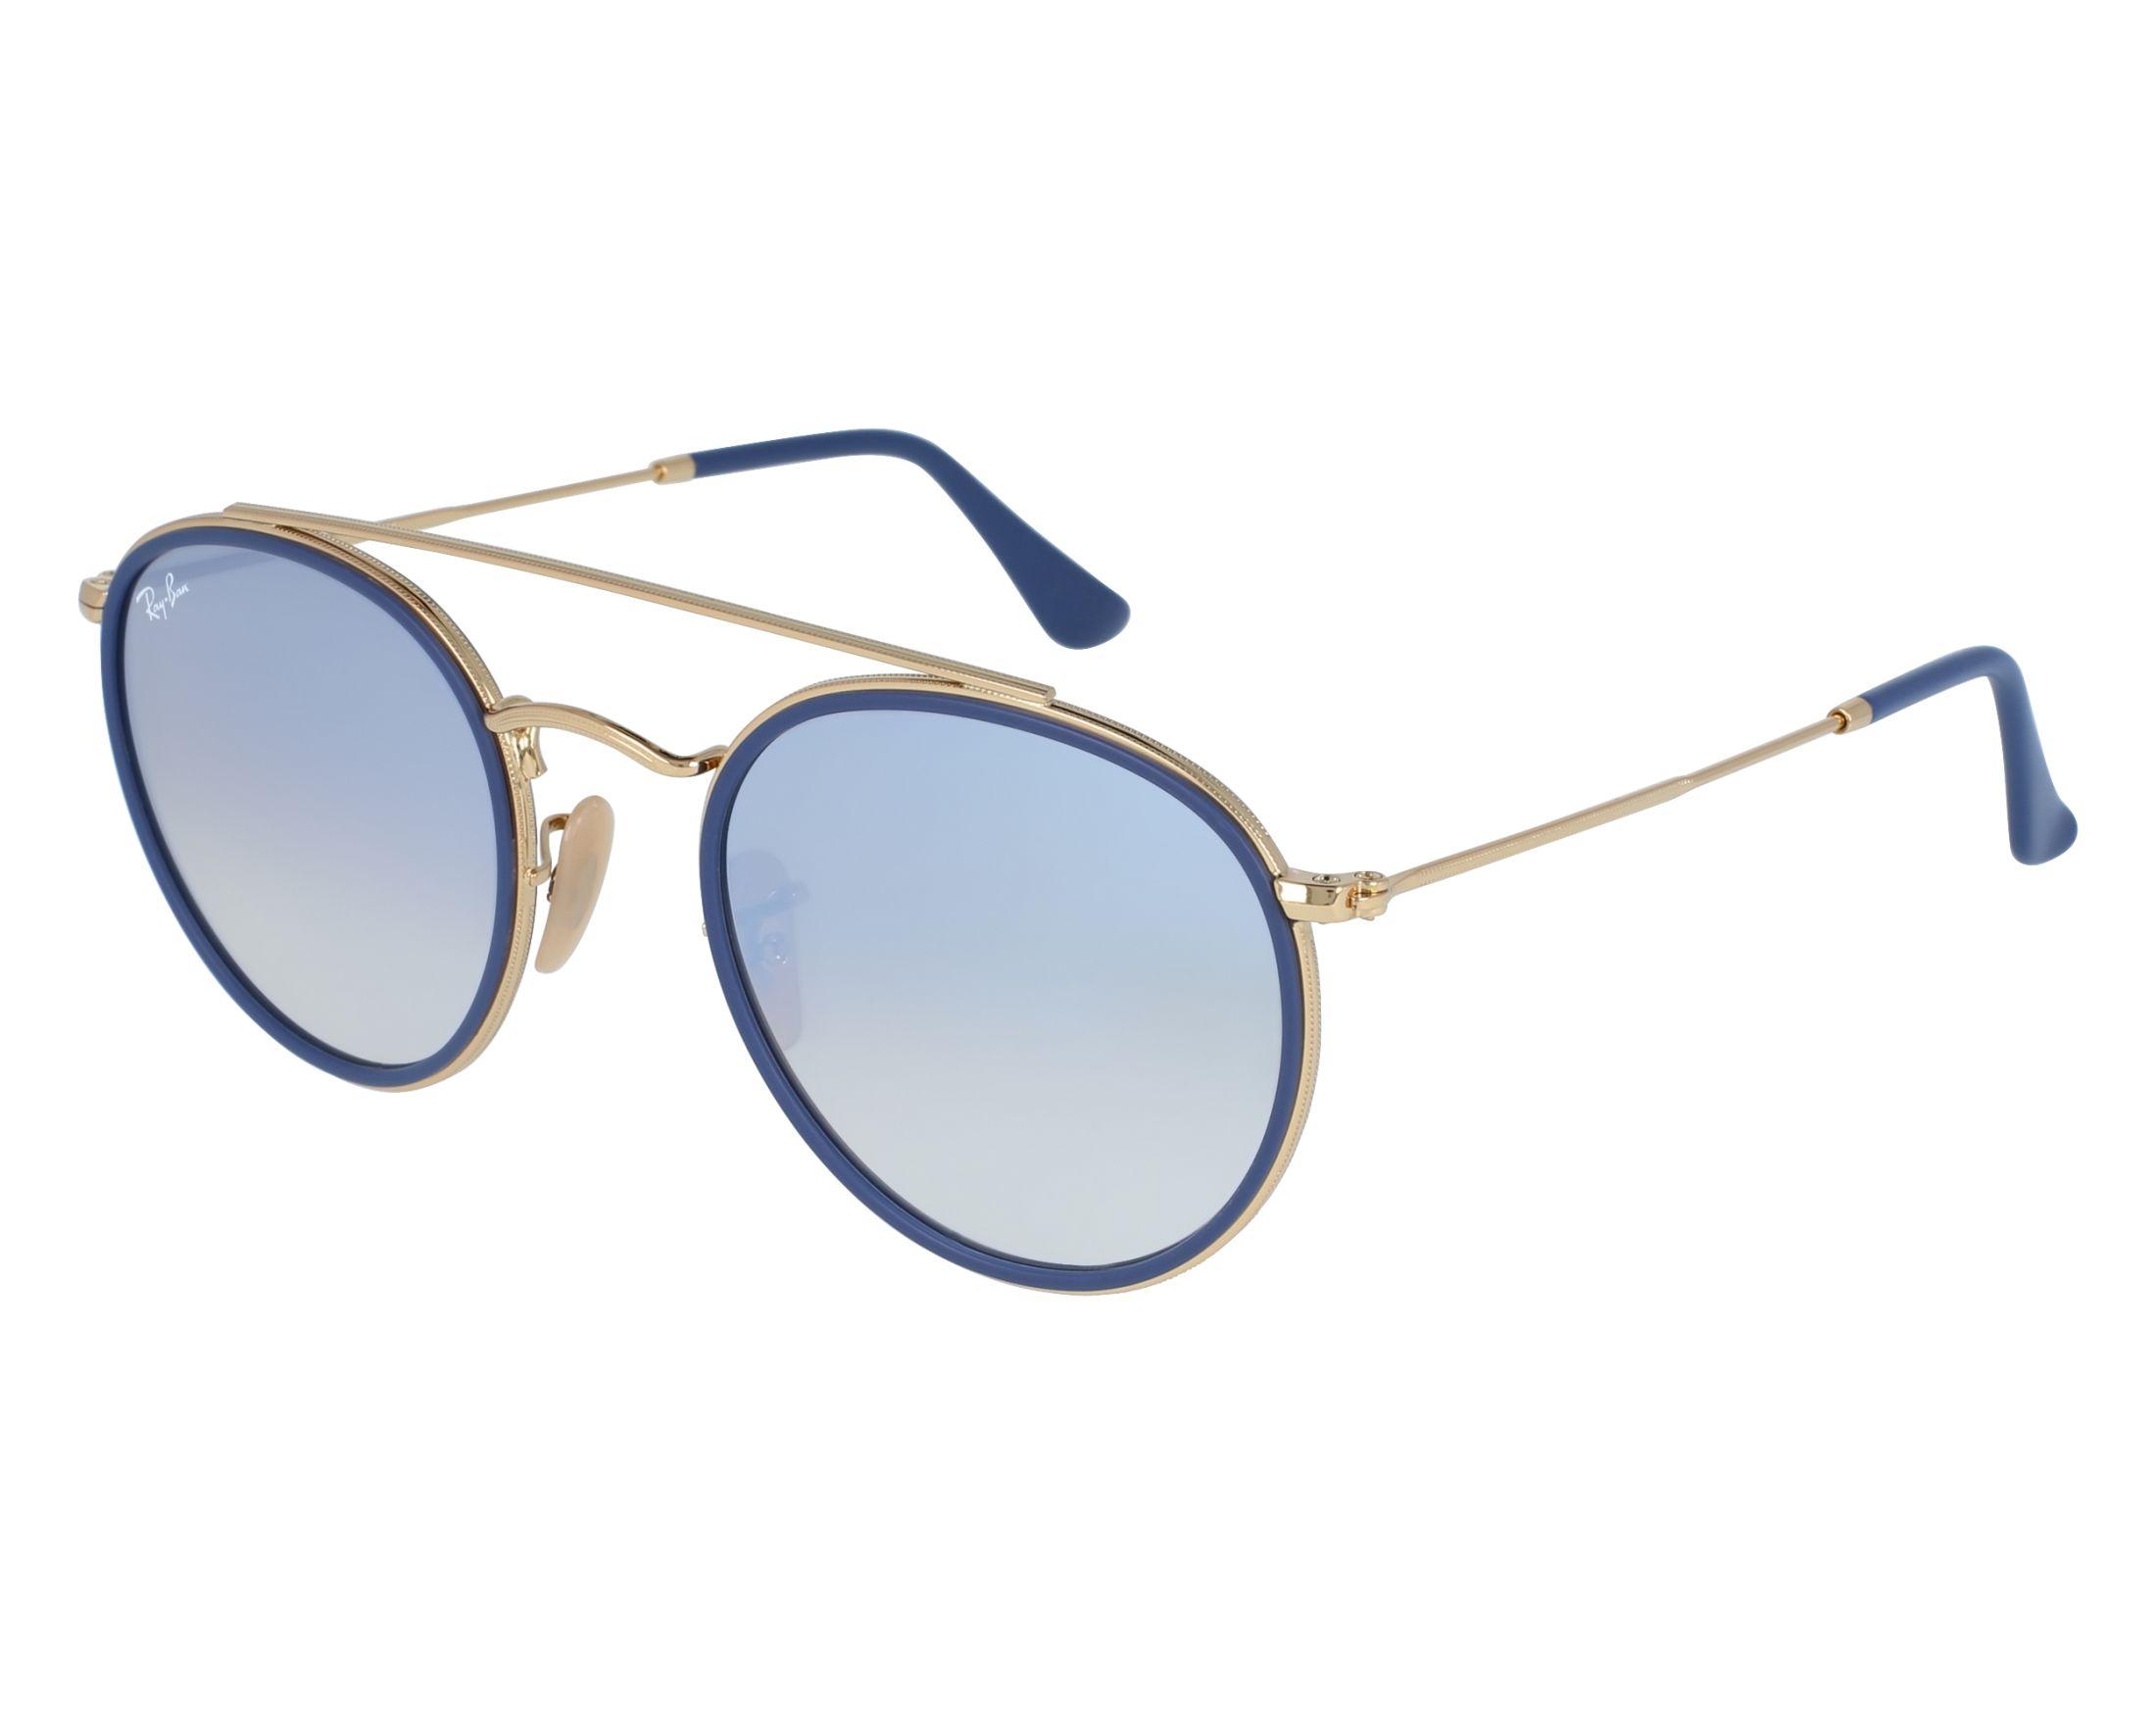 ba2ec4915edf6 Sunglasses Ray-Ban RB-3647-N 001 9U 51-22 Gold